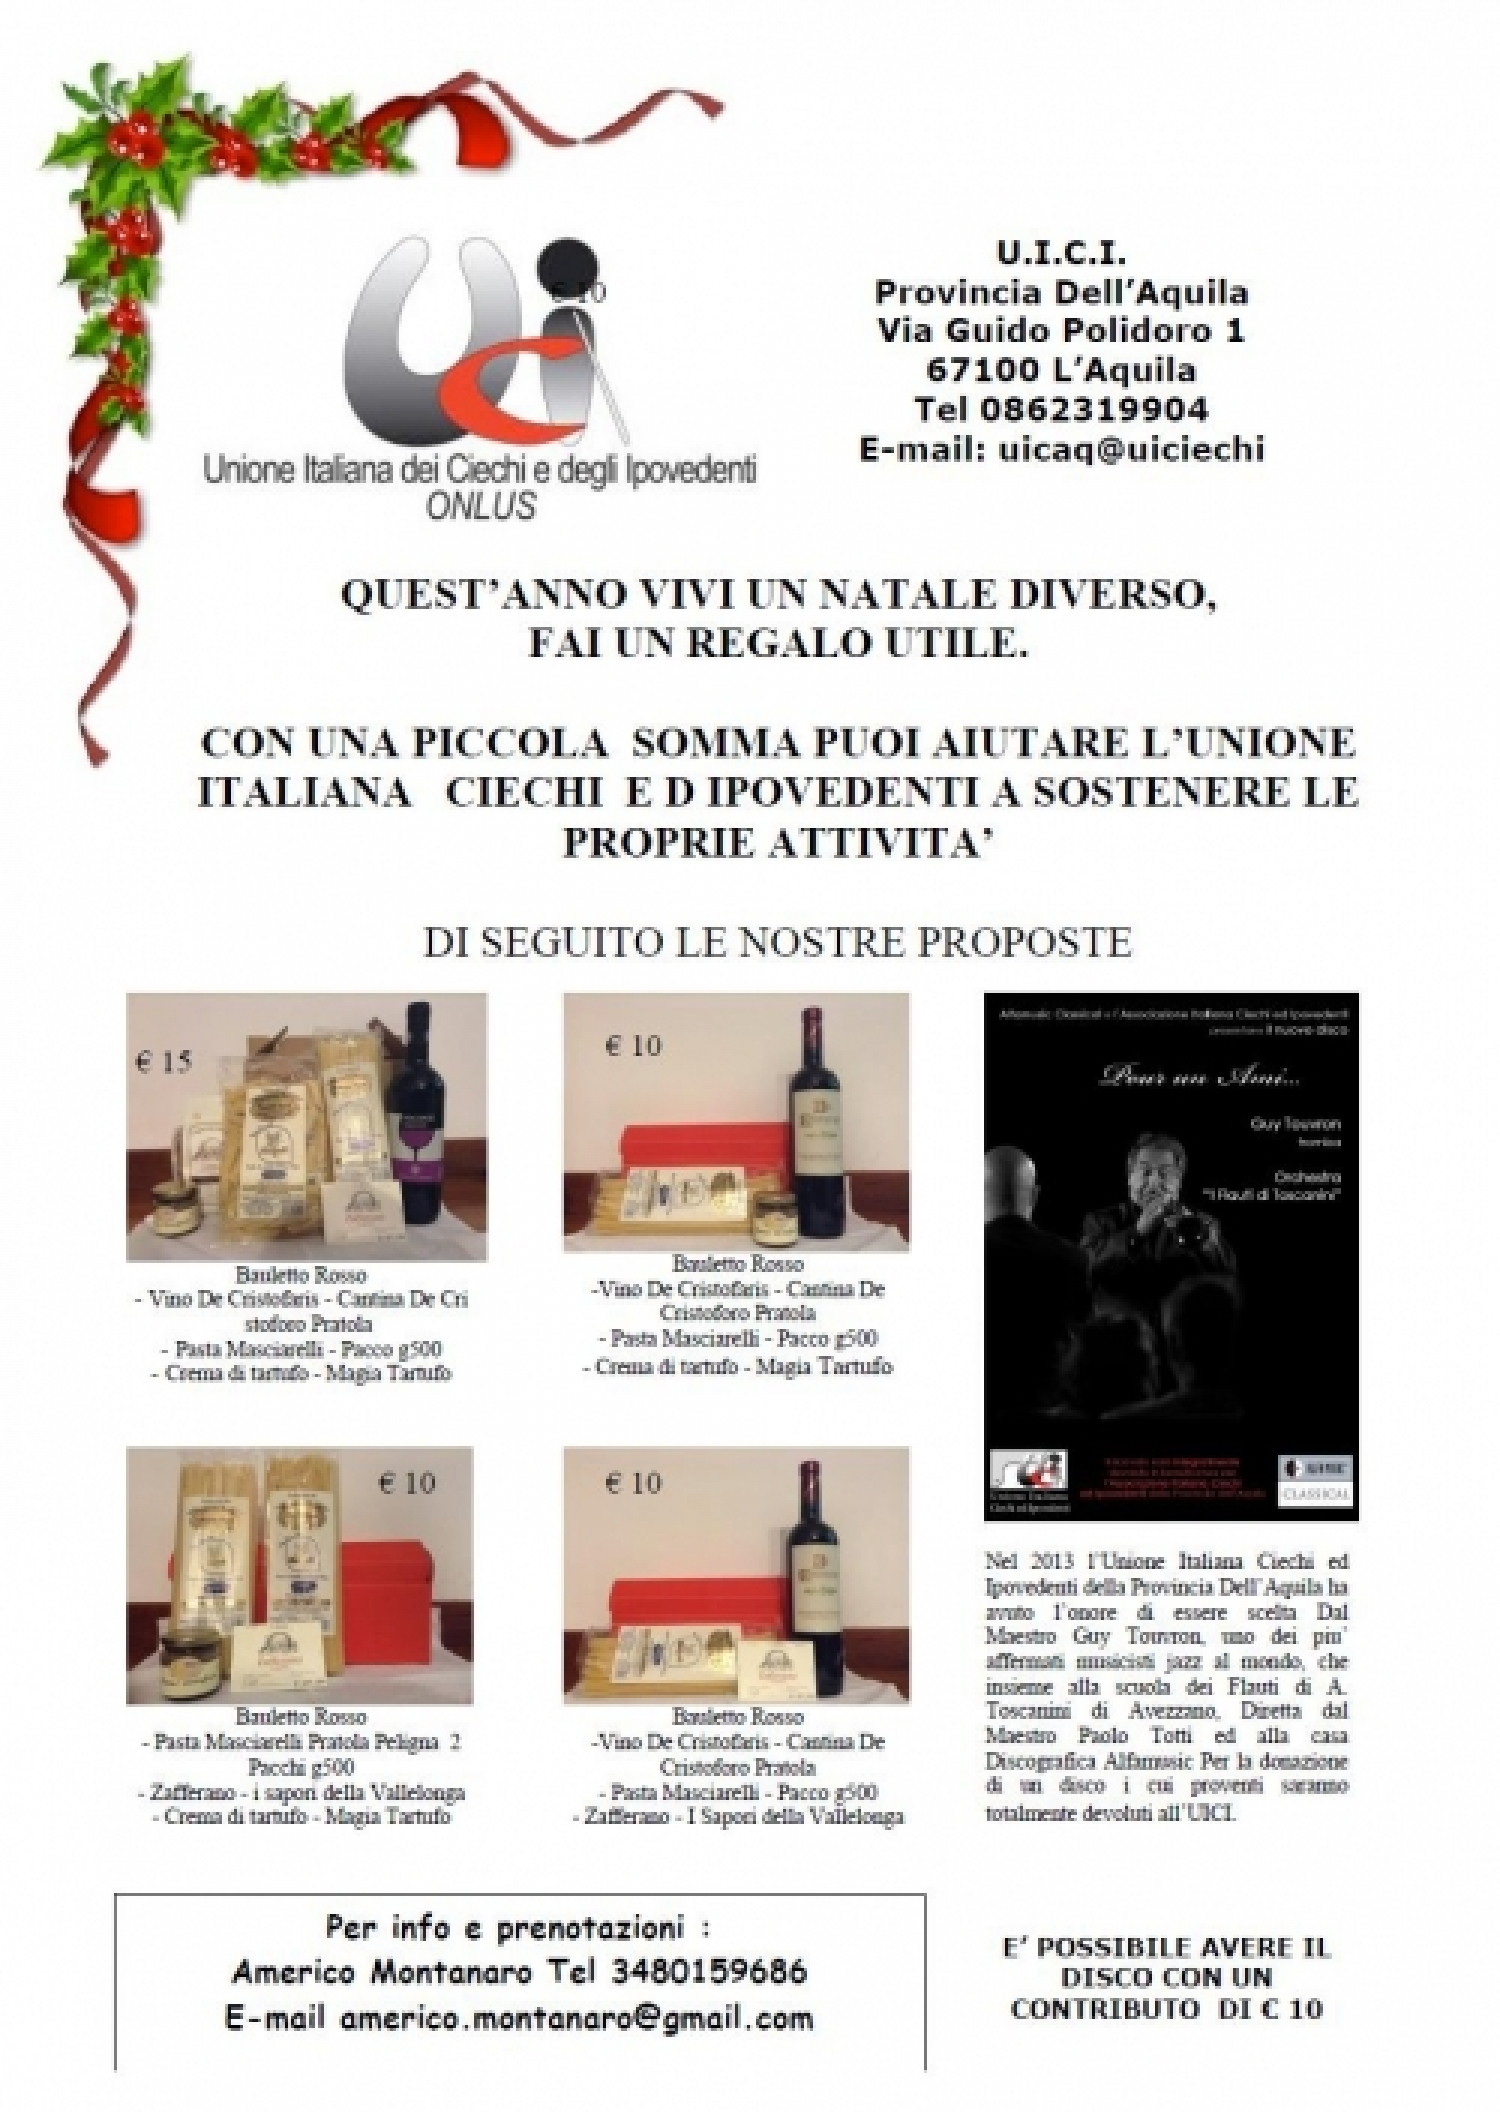 Unione Italiana Ciechi.JPG